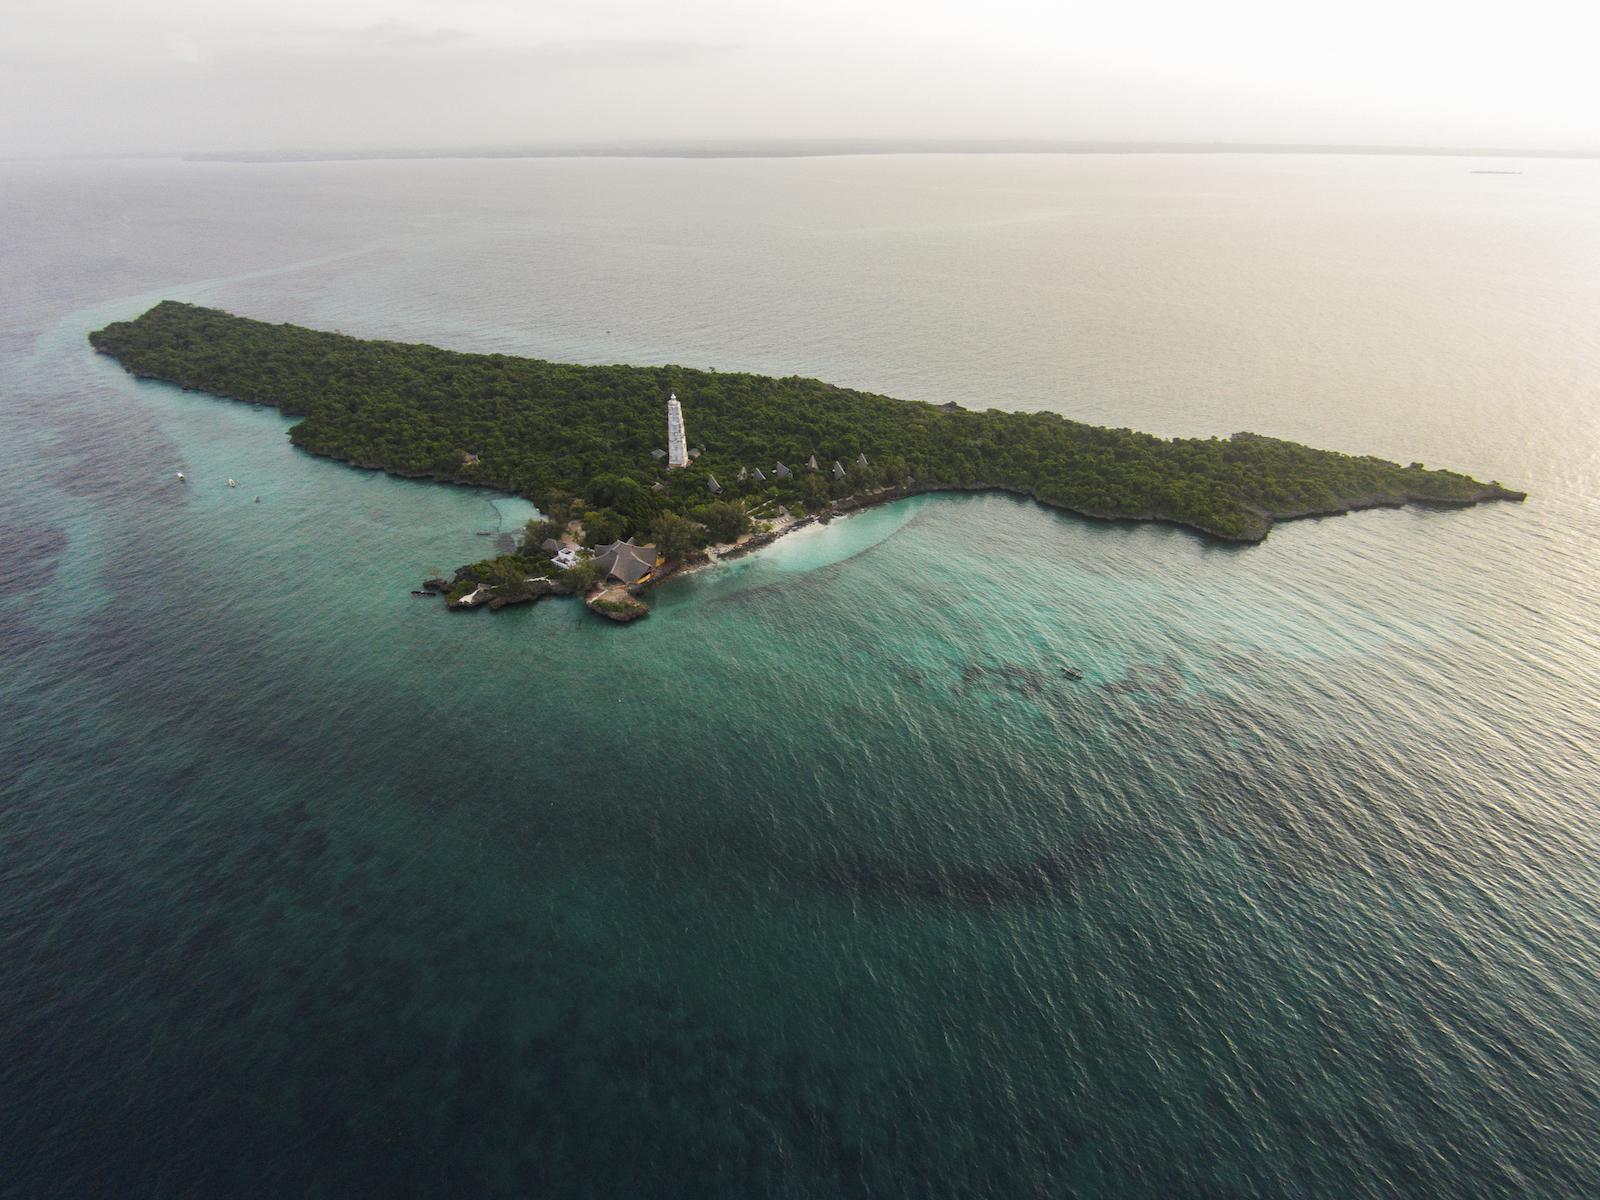 Chumbe Island (Photo Courtesy of Chumbe Island Coral Park)